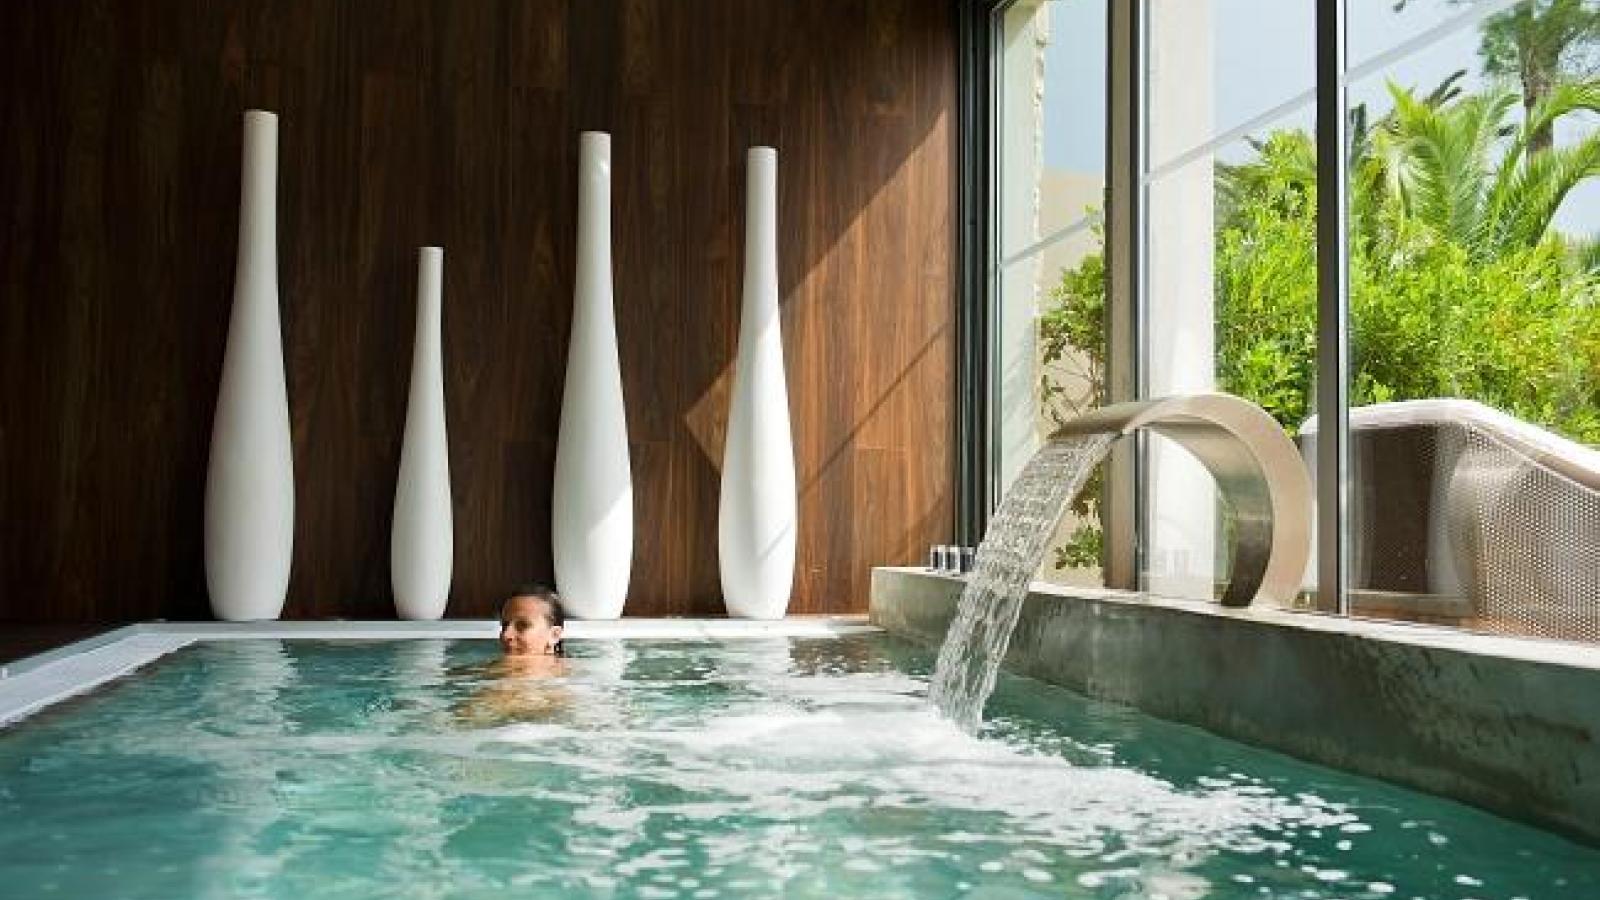 Wellness at Sezz Saint-Tropez